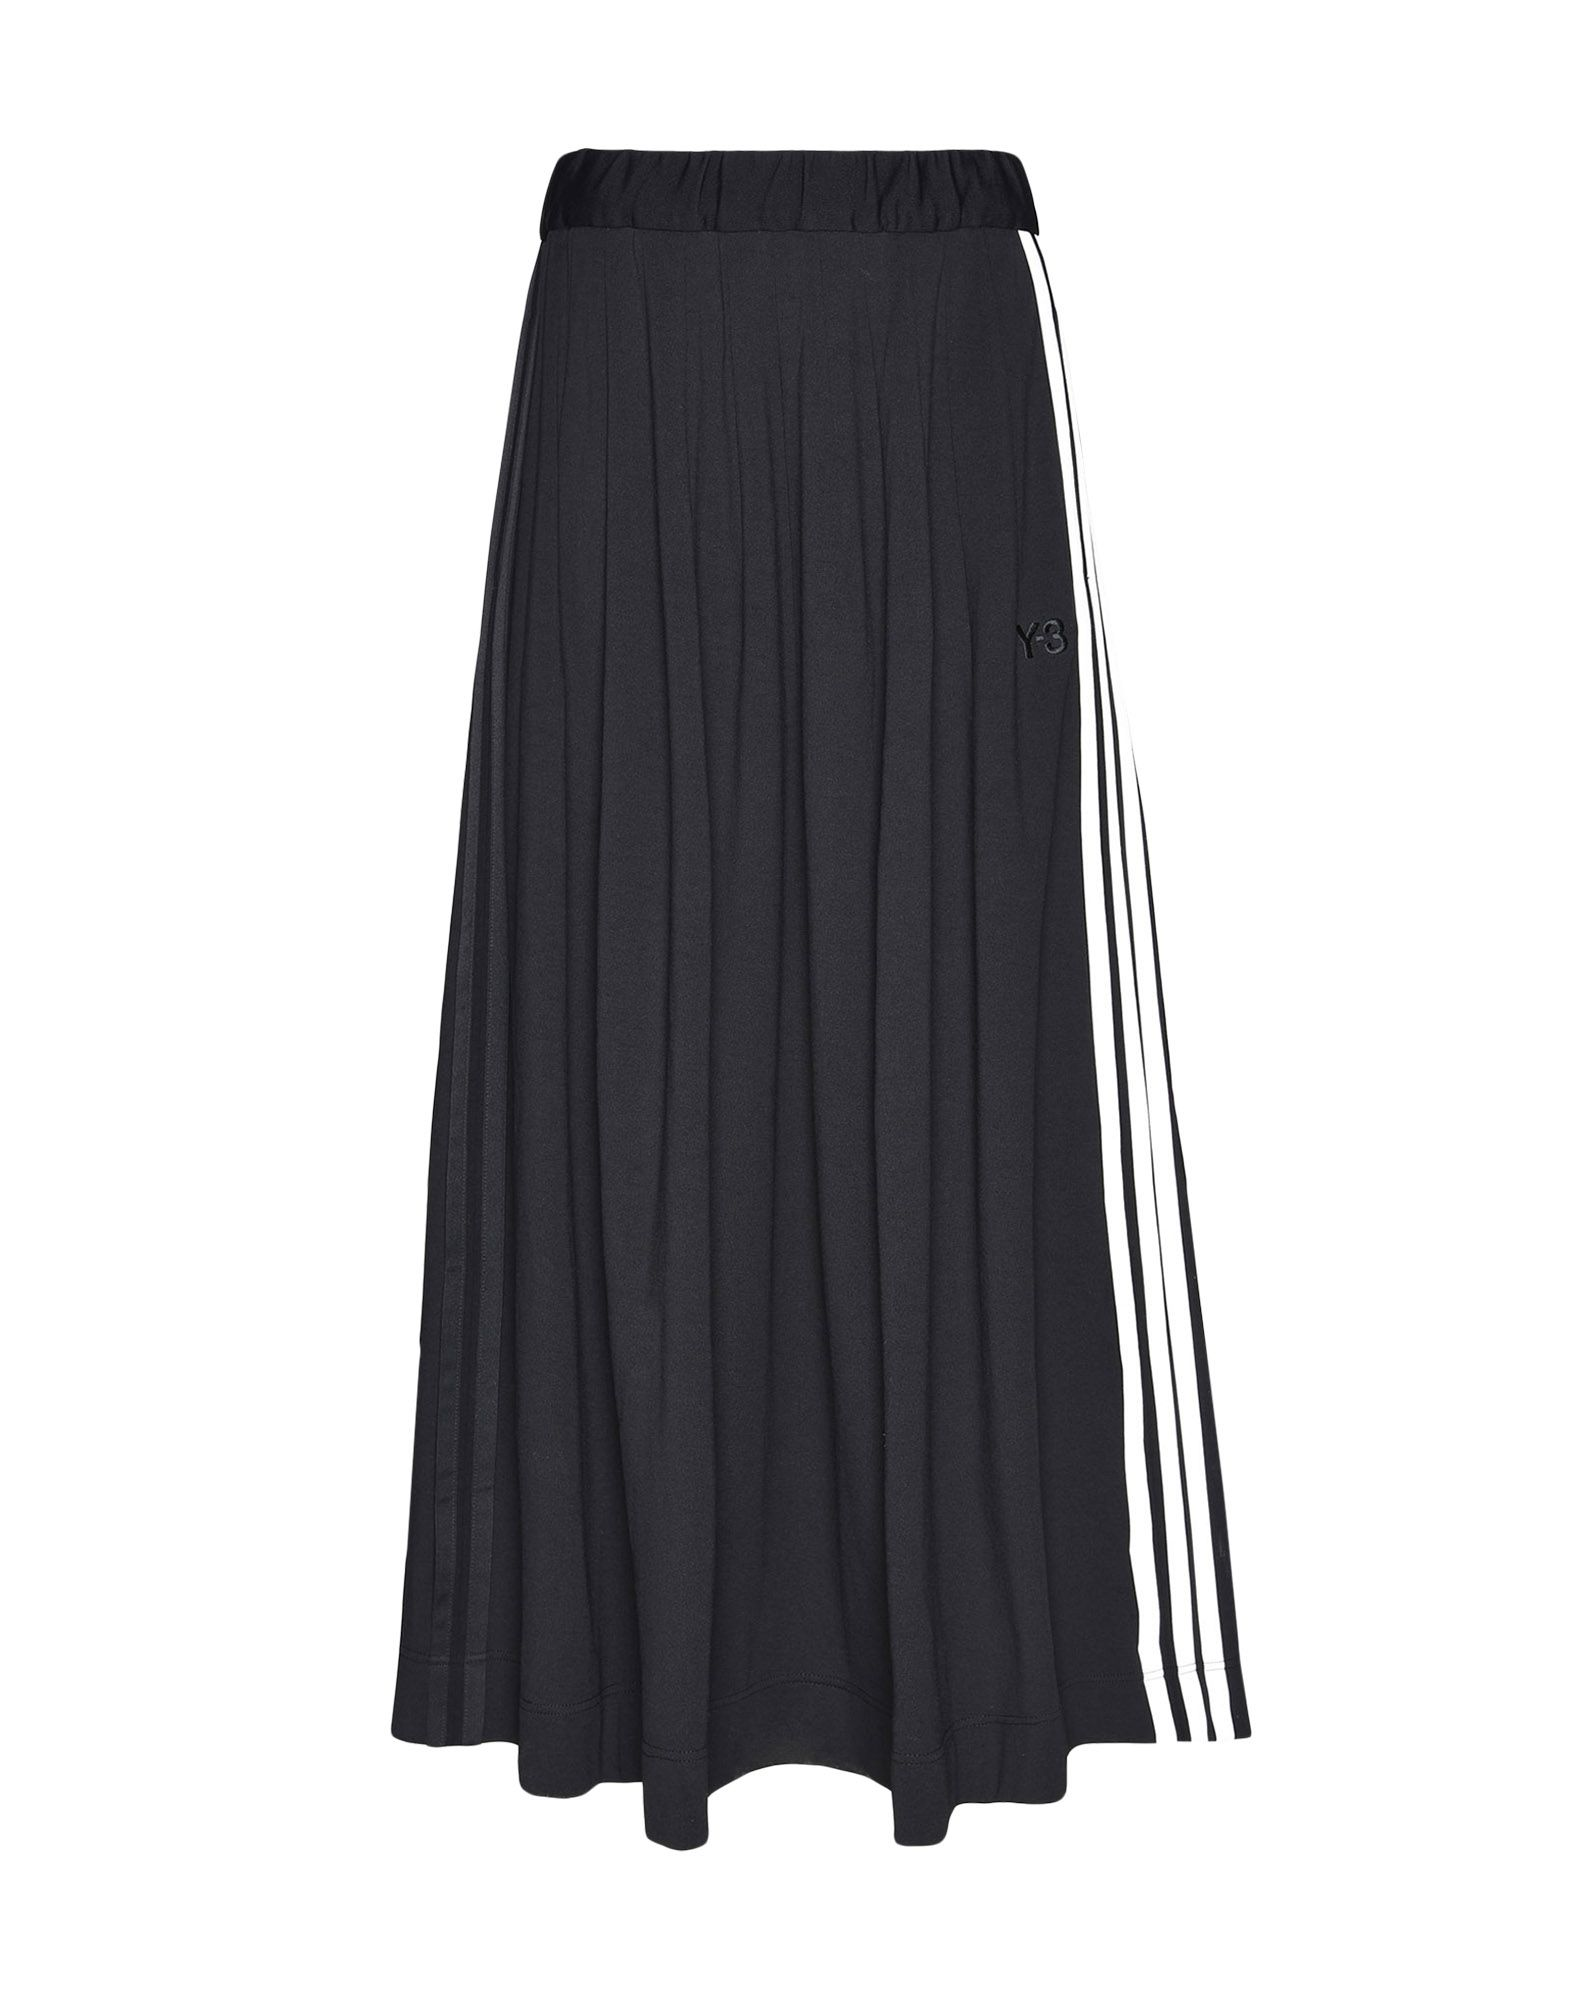 Y-3 Y-3 3-Stripes Selvedge Matte Track Skirt Юбка до колена Для Женщин f